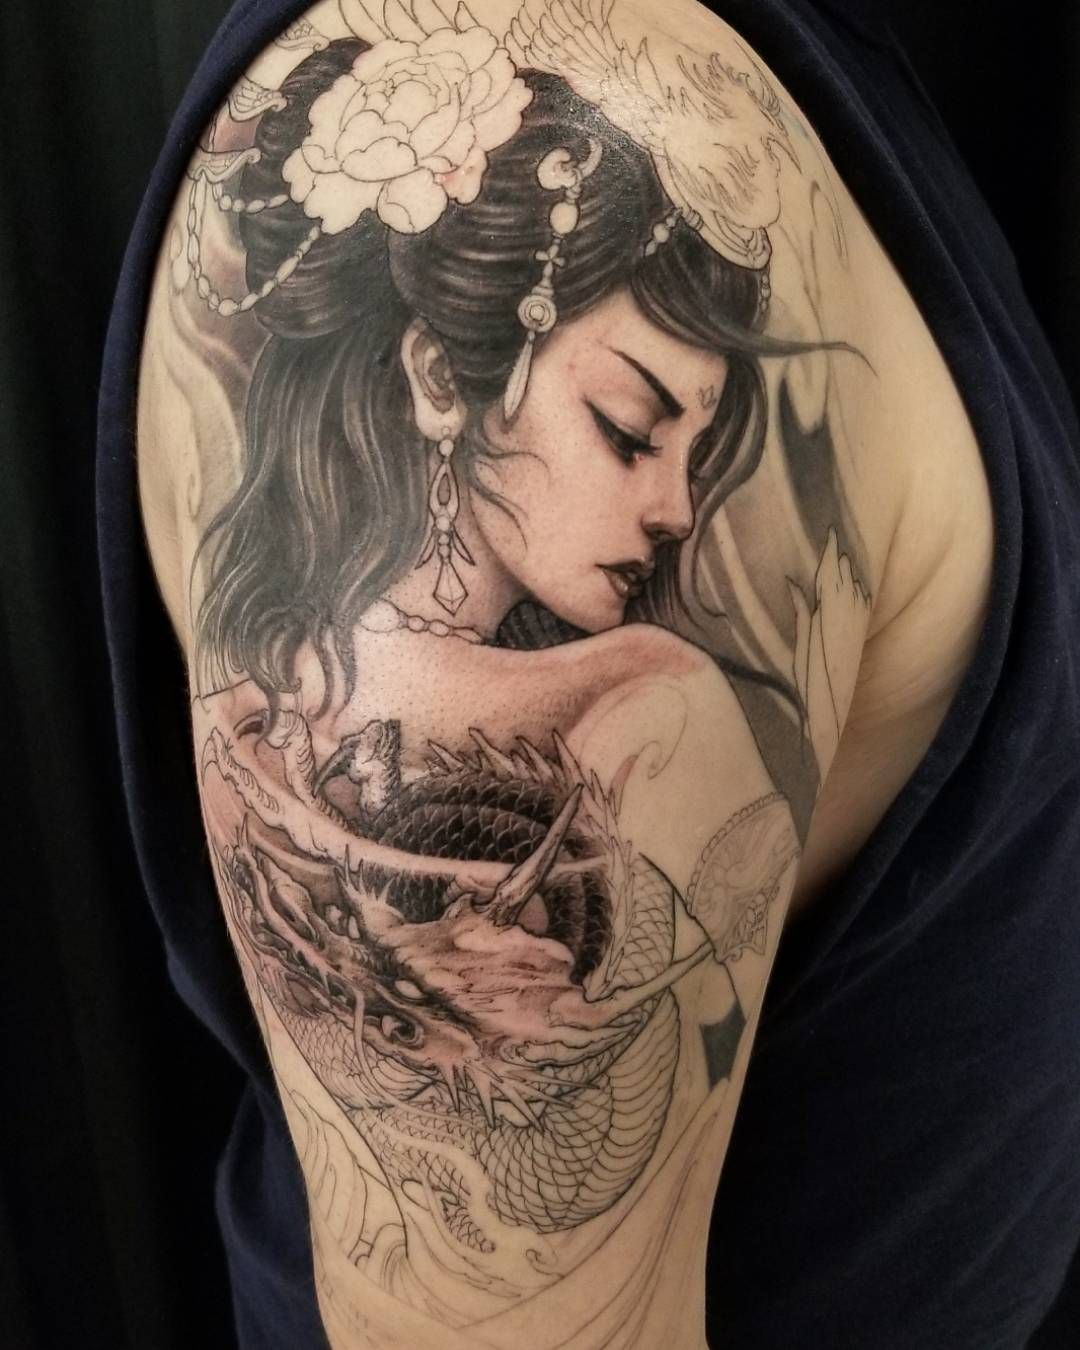 David Hoang On Instagram Back To Back Tiger Tattoo: Geisha In Progress #chronicink #asianink#tattoo#irezumi